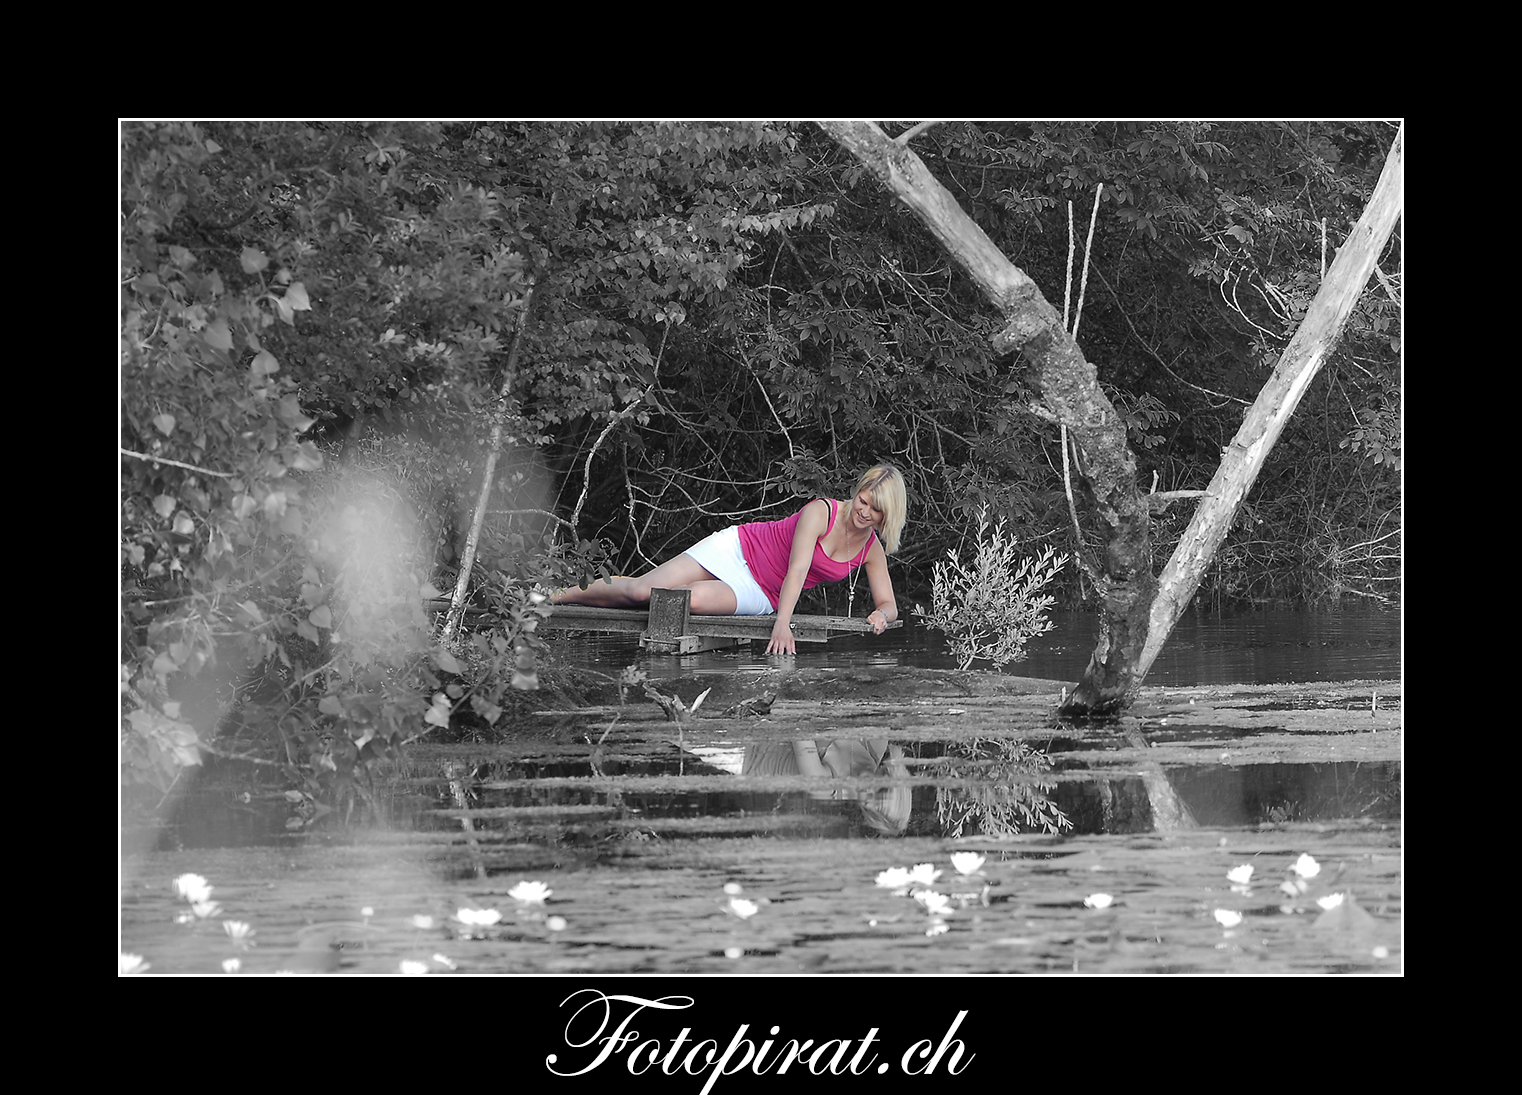 Fotoshooting, outdoor, Modelagentur, eyecatcher, Fitnessmodel, Teich, blondes Fotomodel